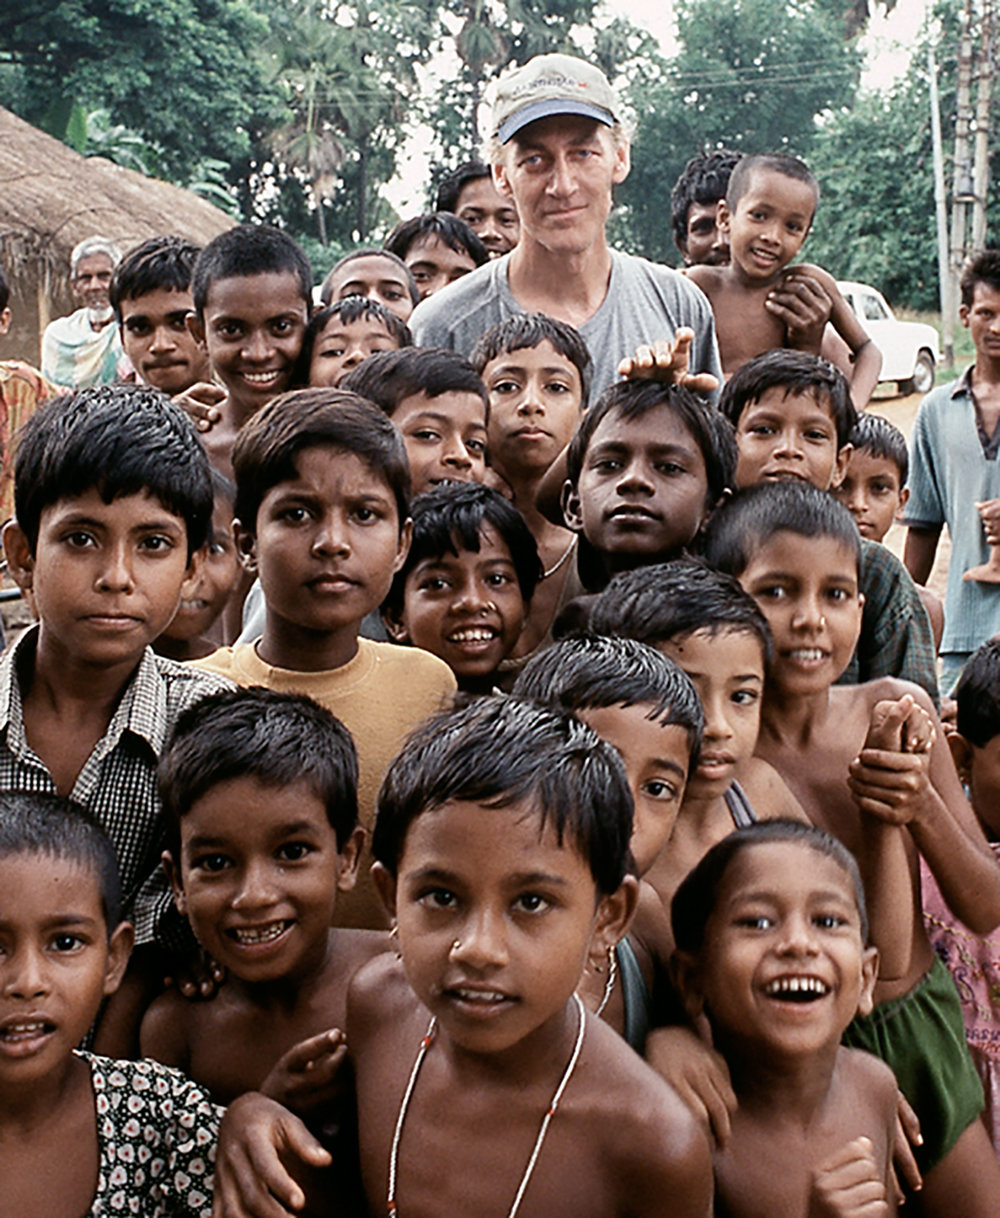 Bihar, India. 2008